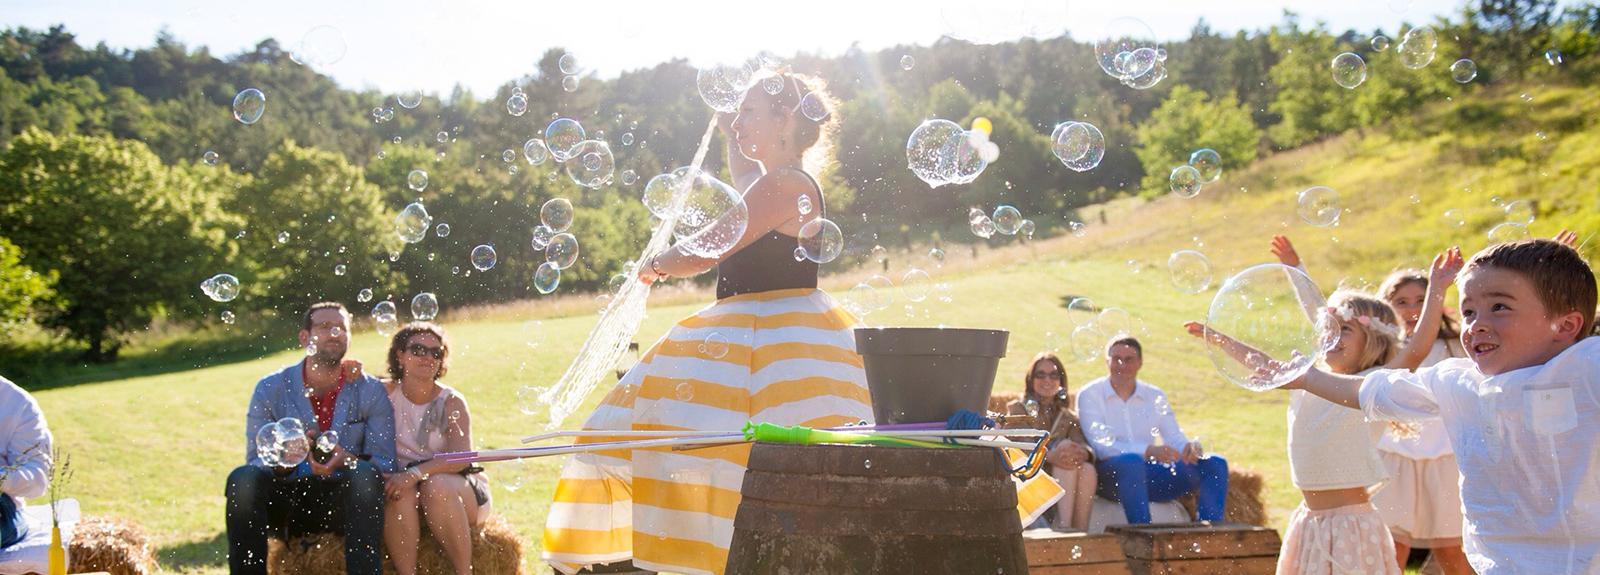 Déam»bulles»ation – Cie Lurluberlue